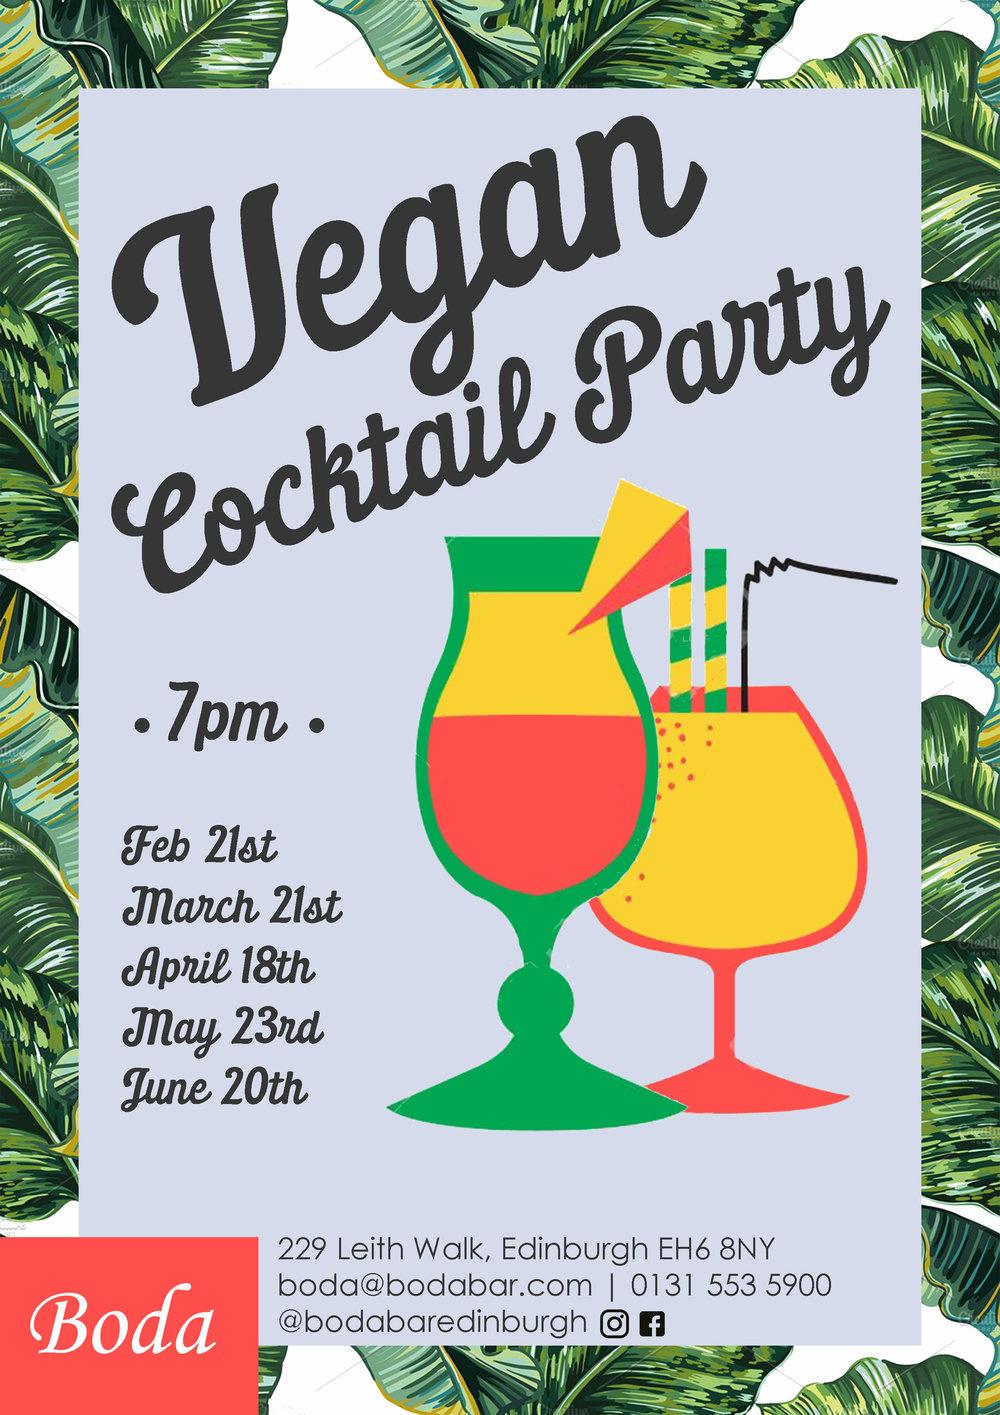 Cocktail party Boda.jpg